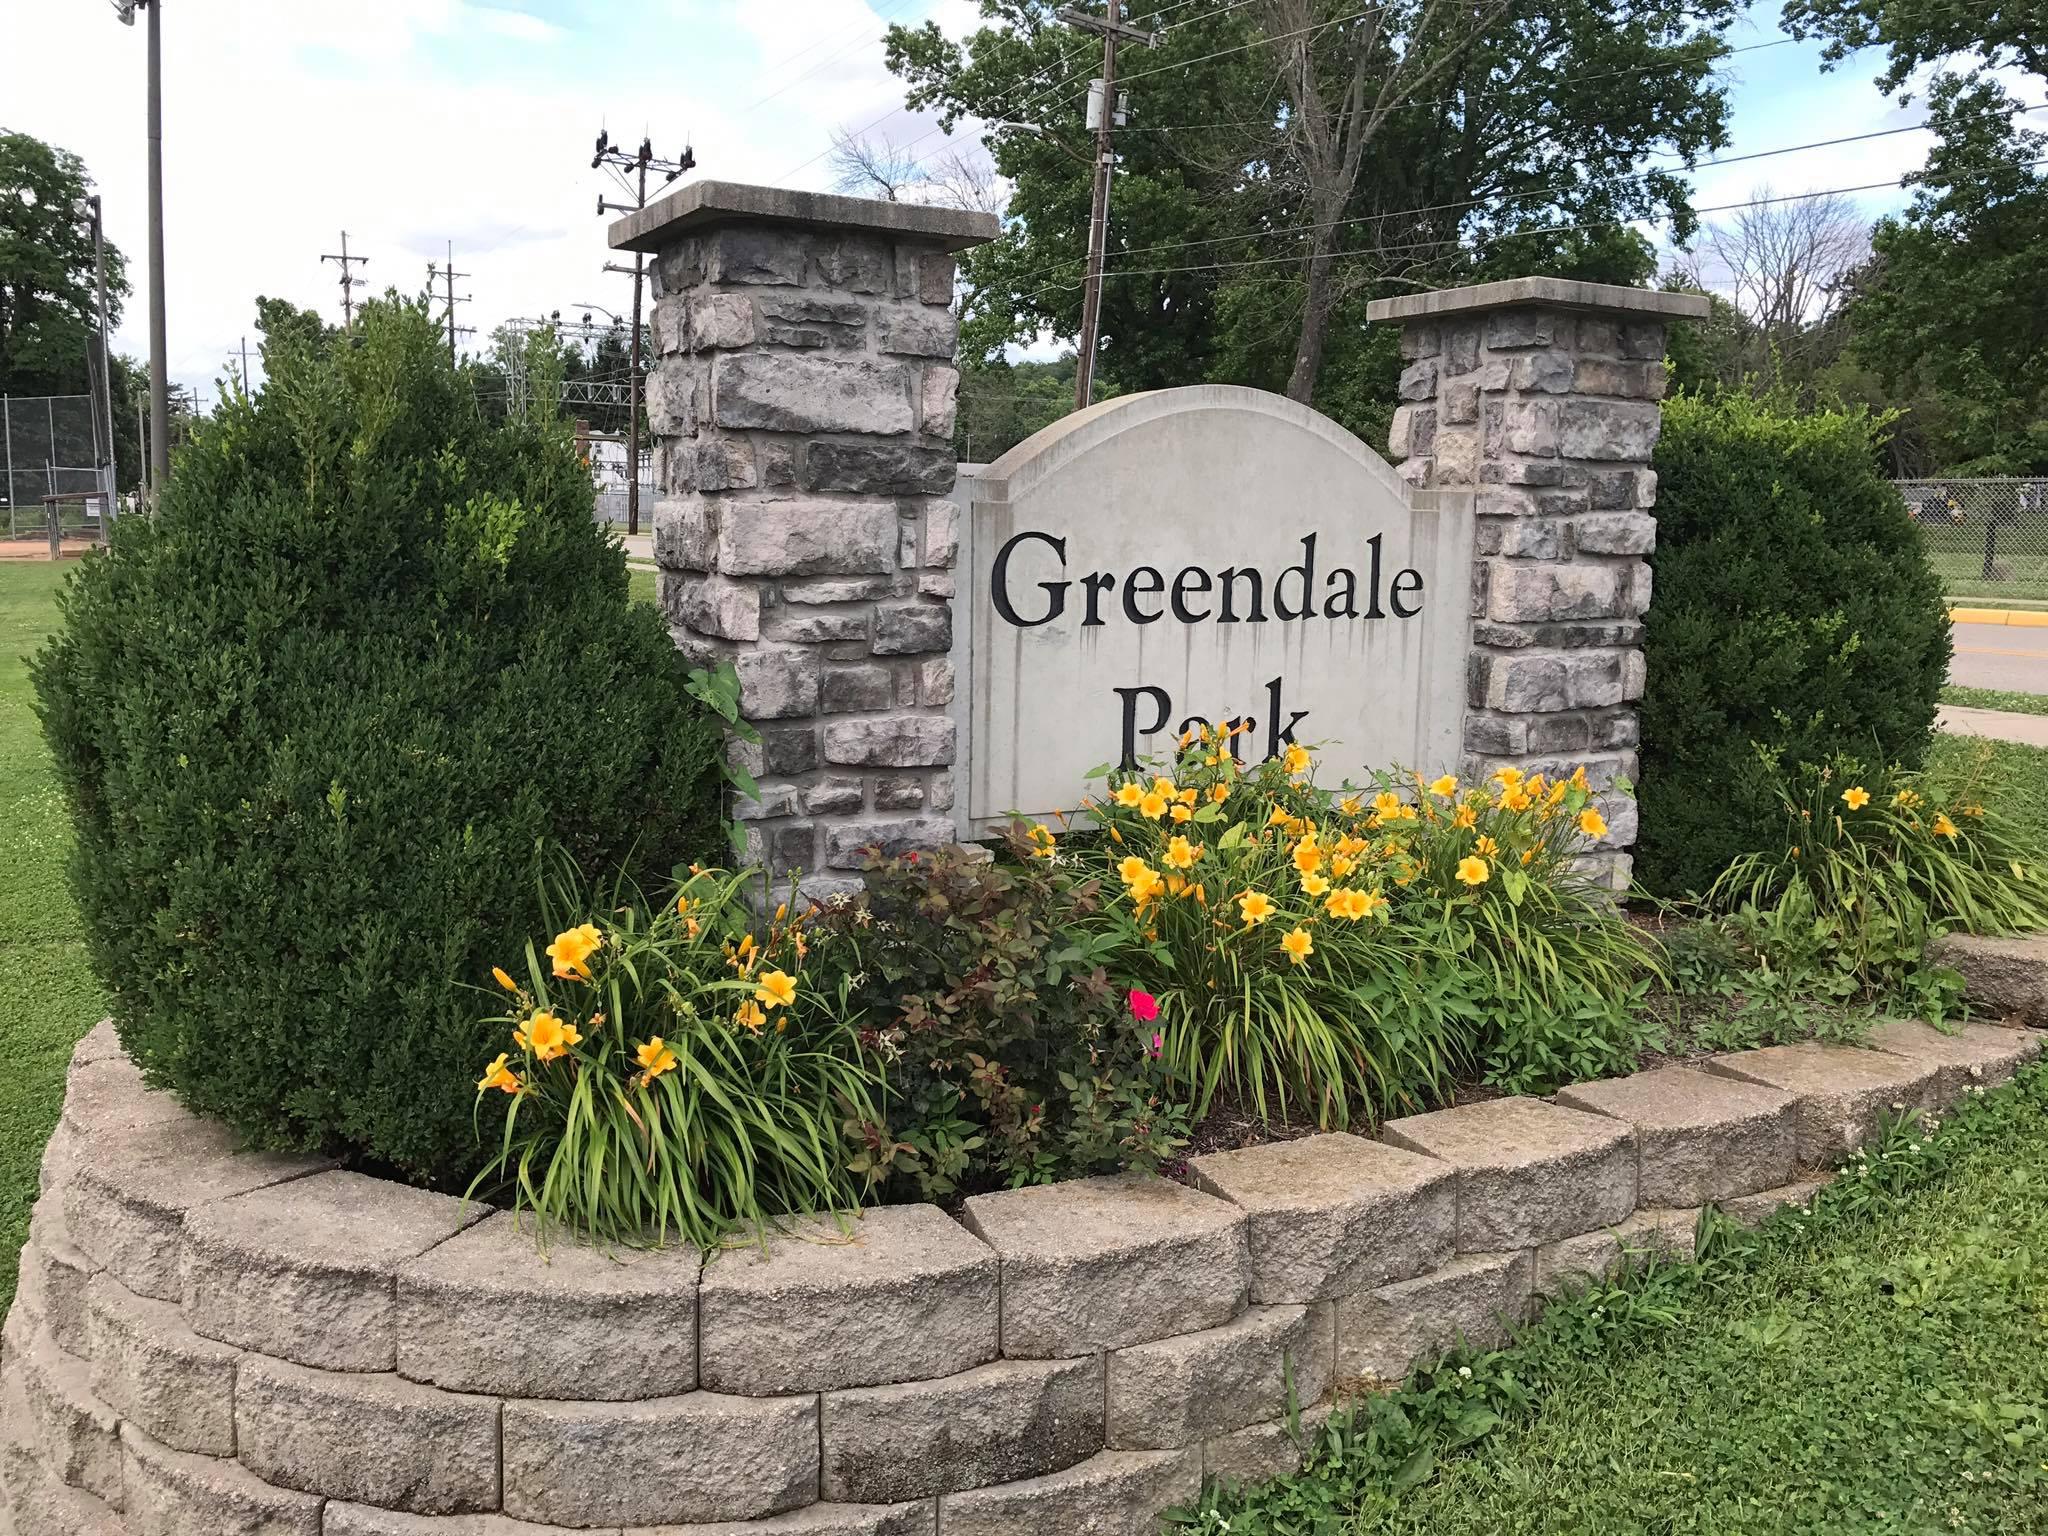 Greendale Park